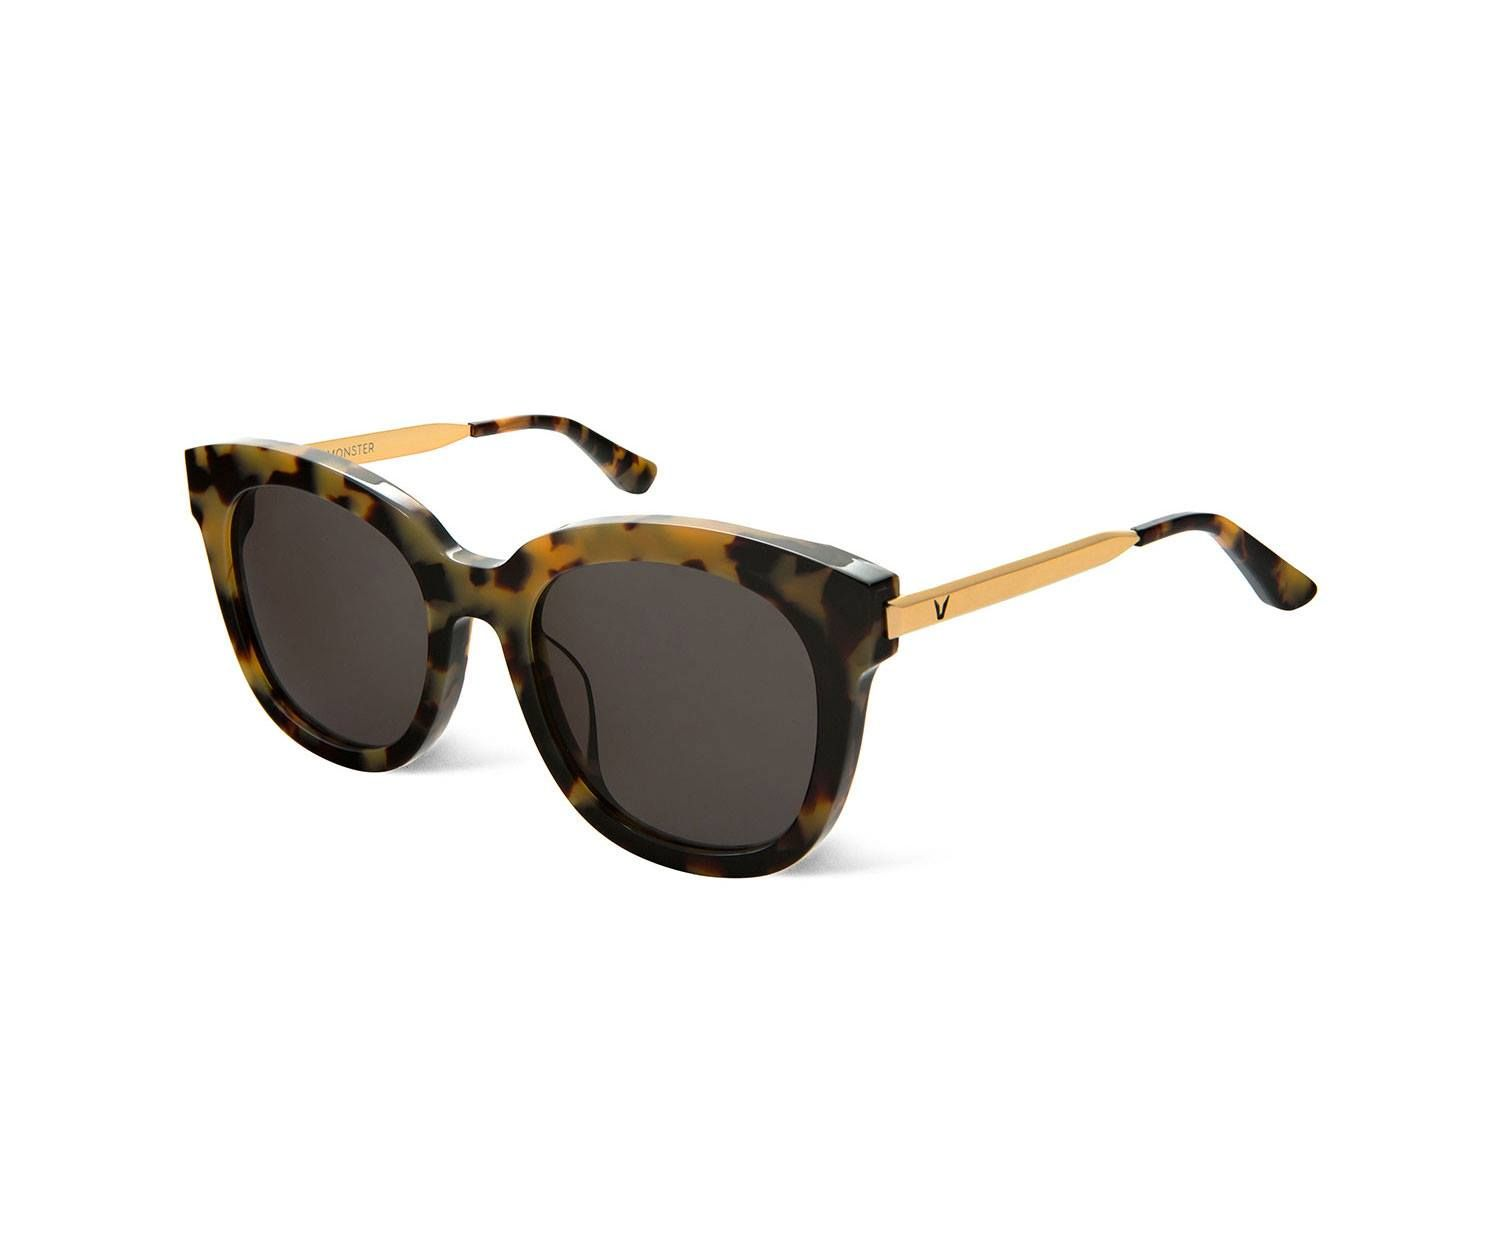 53dc500c23dd New 2016 Gentle Monster Sunglasses in Sydney at Lifestyle Optical QVB.   GentleMonster  QVB  Lifestyleoptical  sunglasses